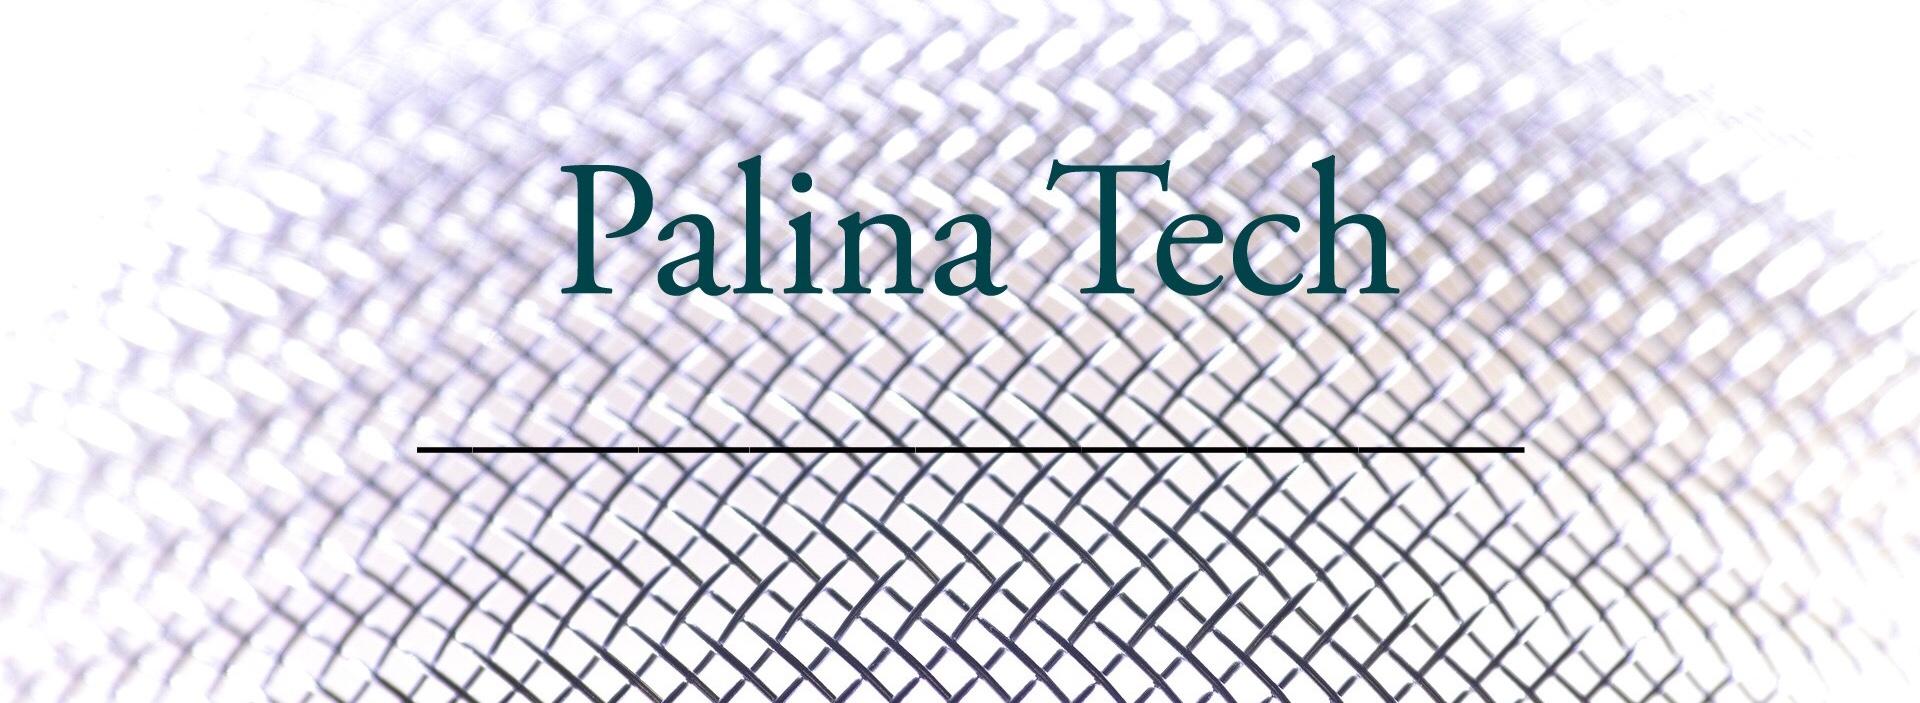 Über Palina Tech